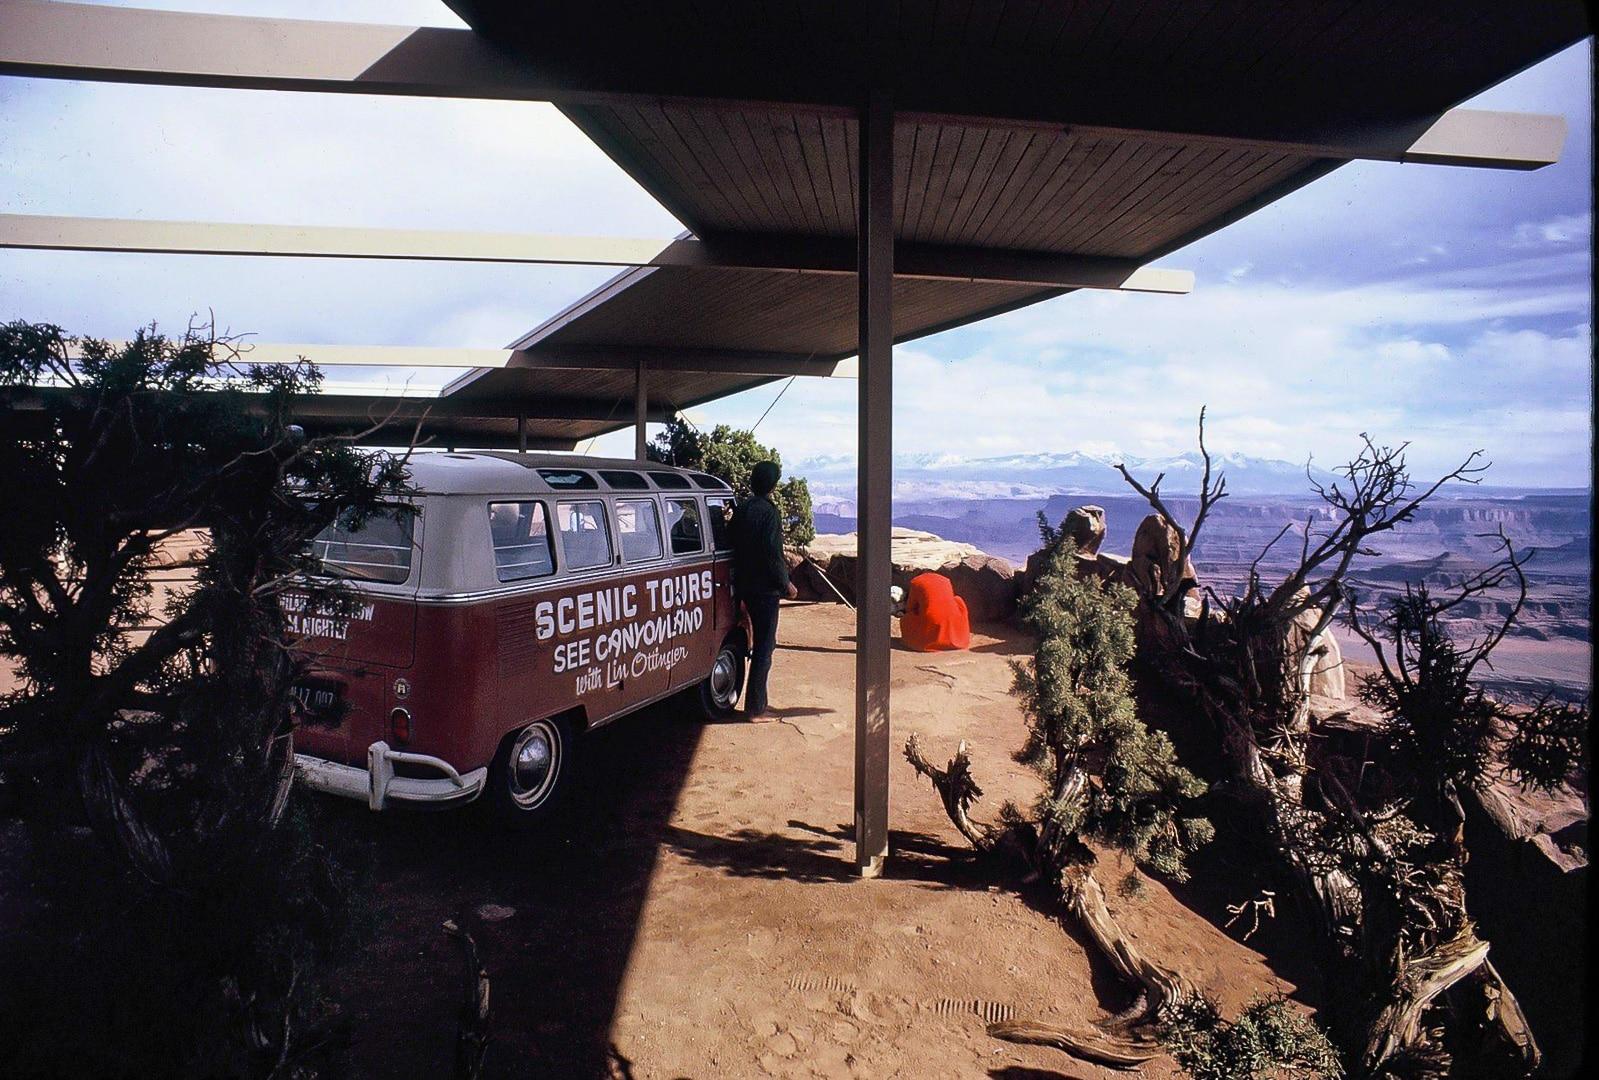 Lin Ottinger Canyon Land Scenic Tour VW Bus - BeCombi - Une-2